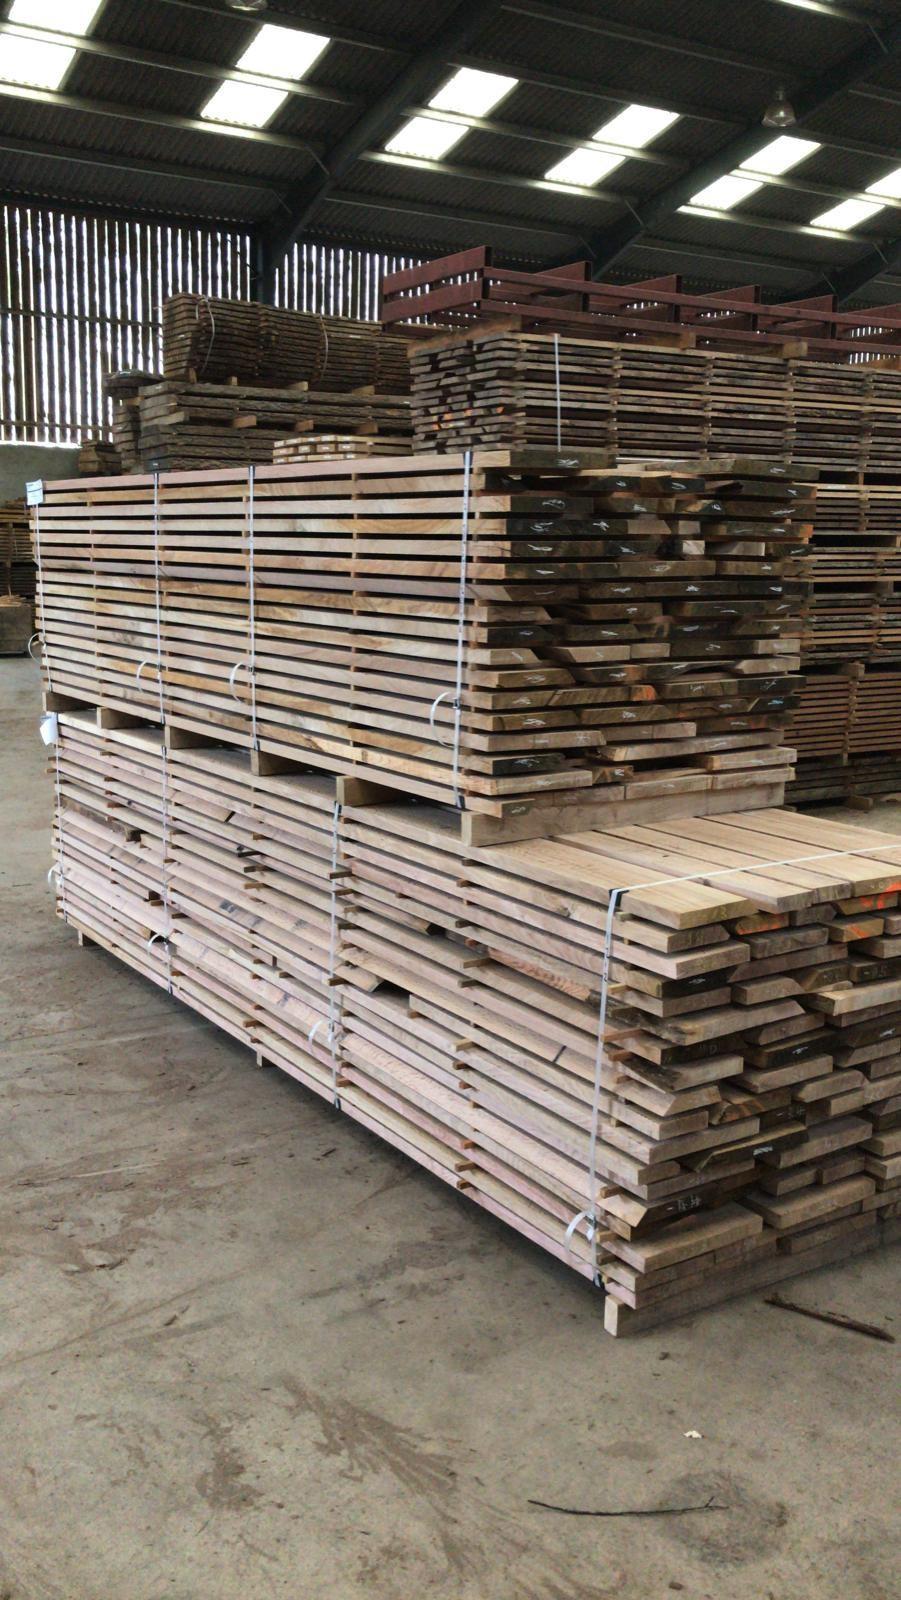 tb_qs-oak-for-barrel-order-2.jpg